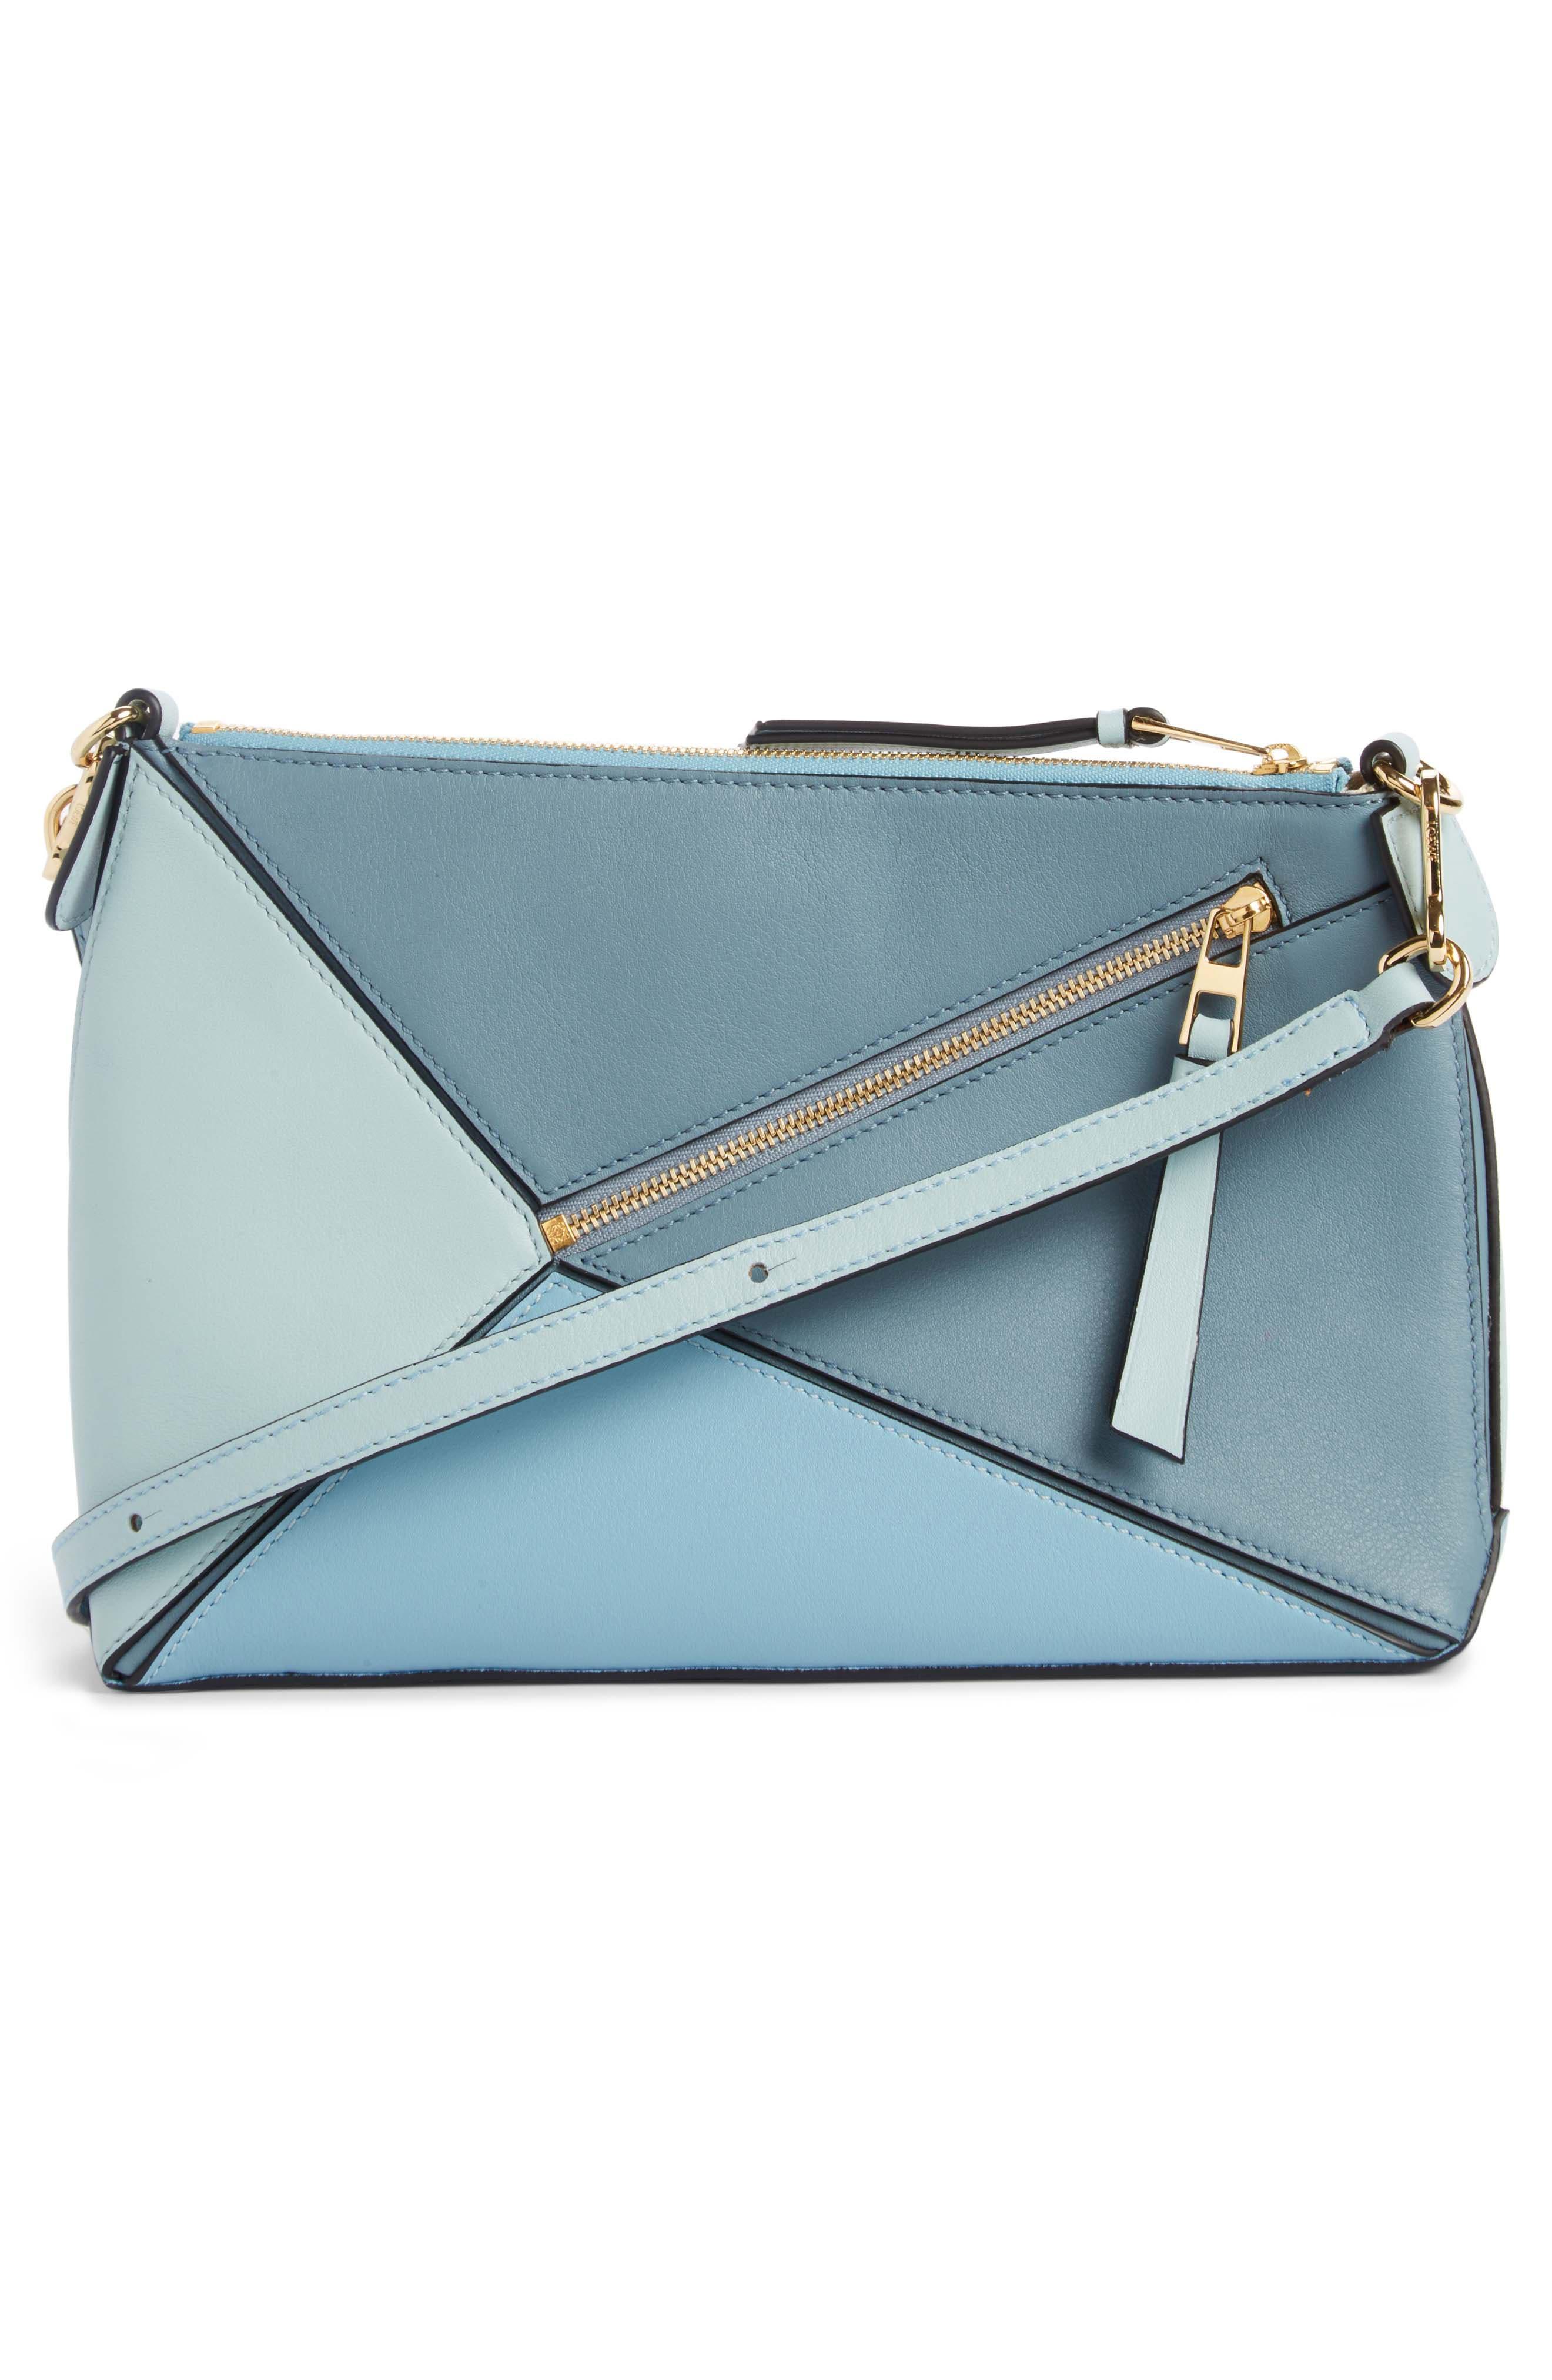 Mini Puzzle Calfskin Leather Crossbody Bag,                             Alternate thumbnail 3, color,                             Stone Blue Multitone